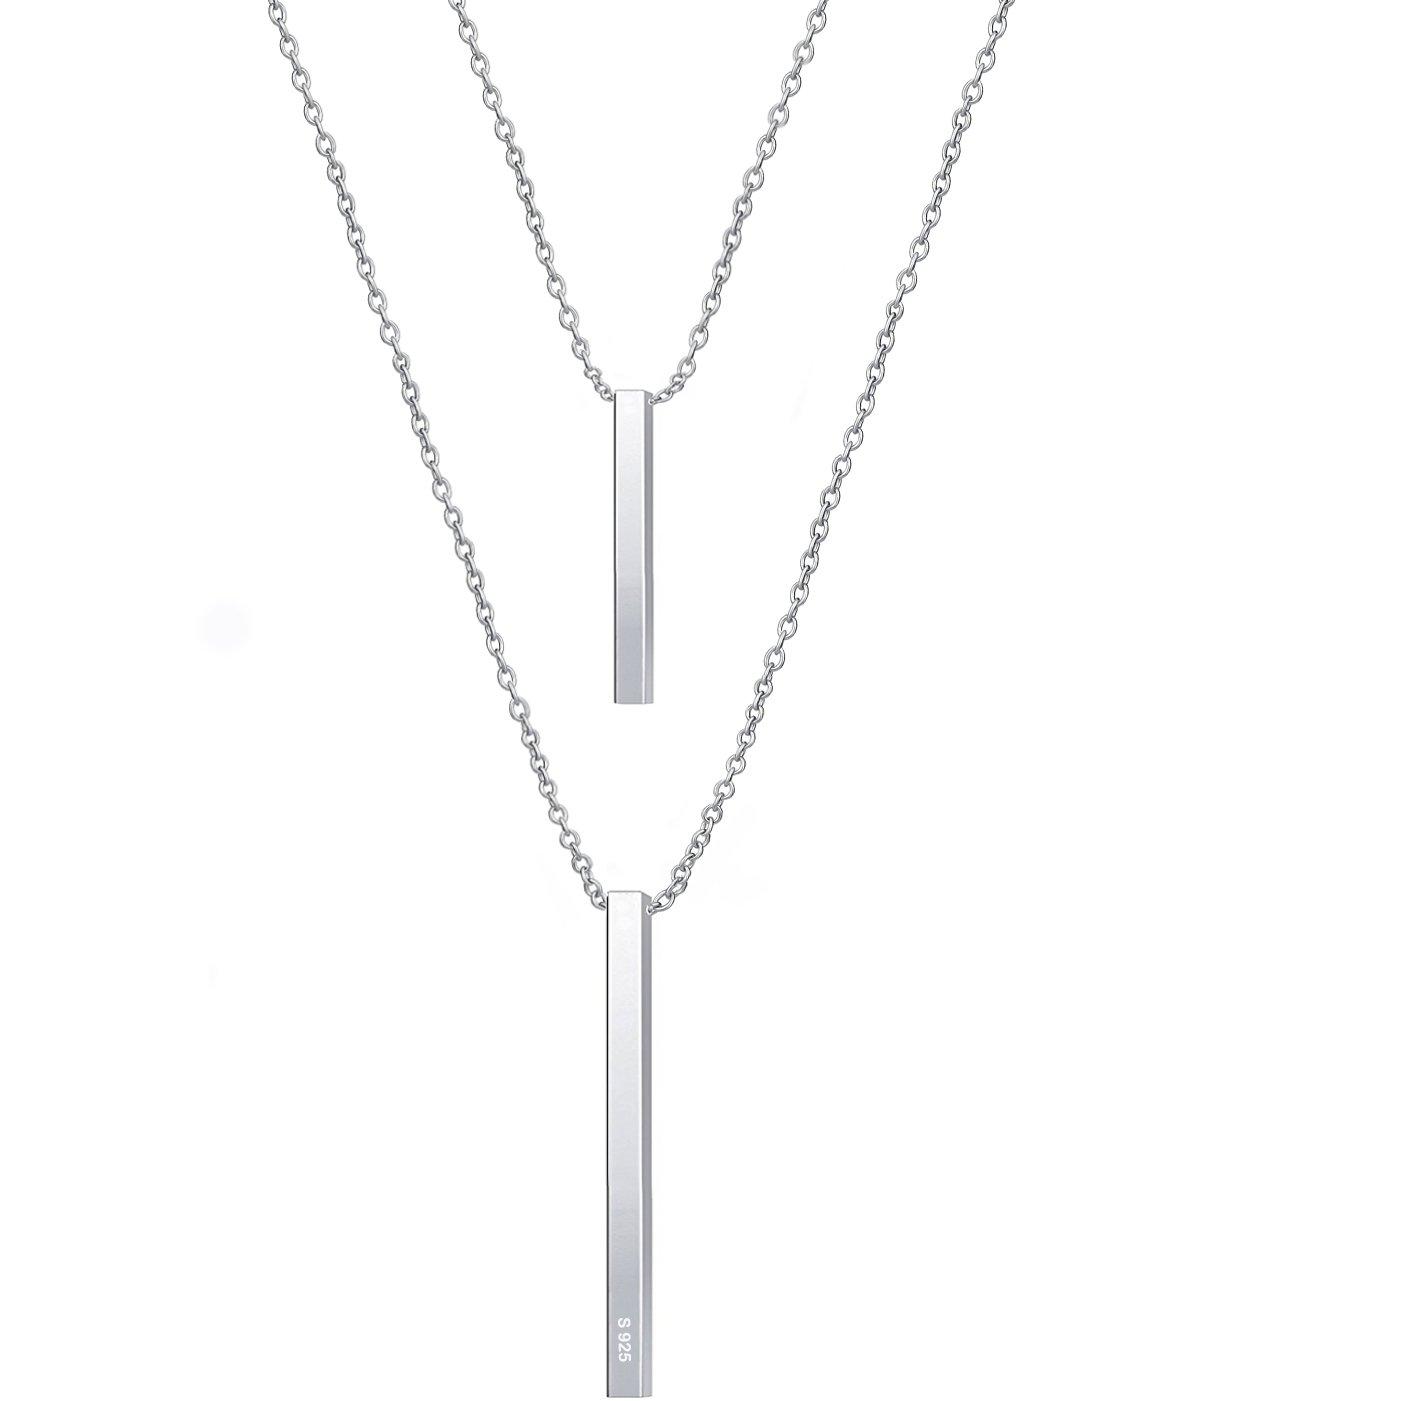 925 Sterling Silver Multilayer Bar Pendant Necklace, Boho Stick Bar Choker Necklace Minimalist Y Necklace for Women